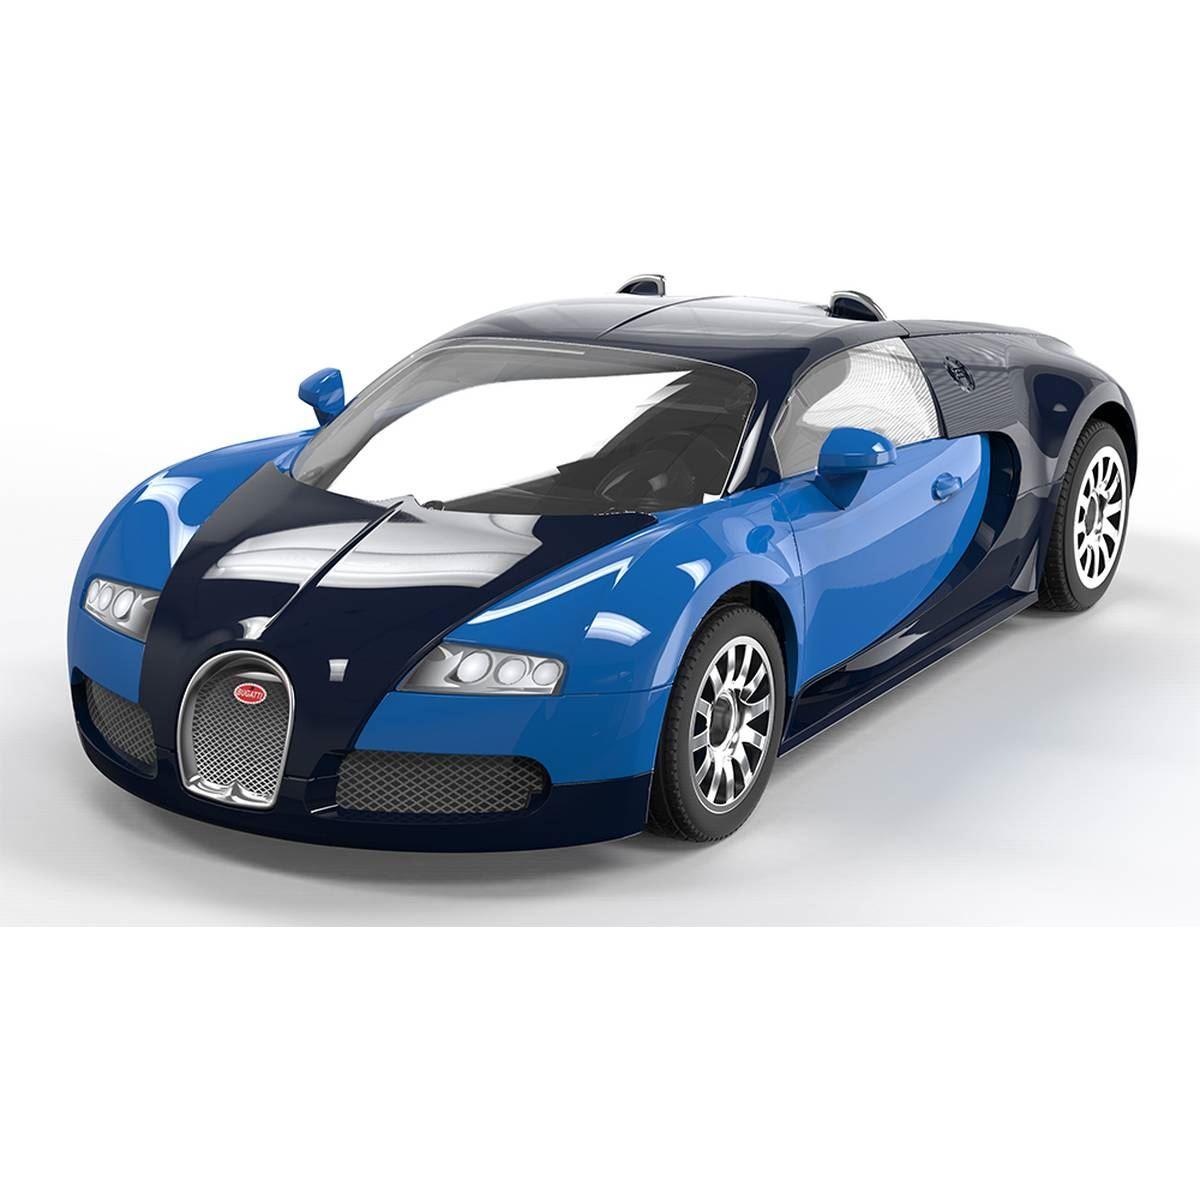 airfix quick build bugatti veyron model kit car construction kids gift toy cr. Black Bedroom Furniture Sets. Home Design Ideas